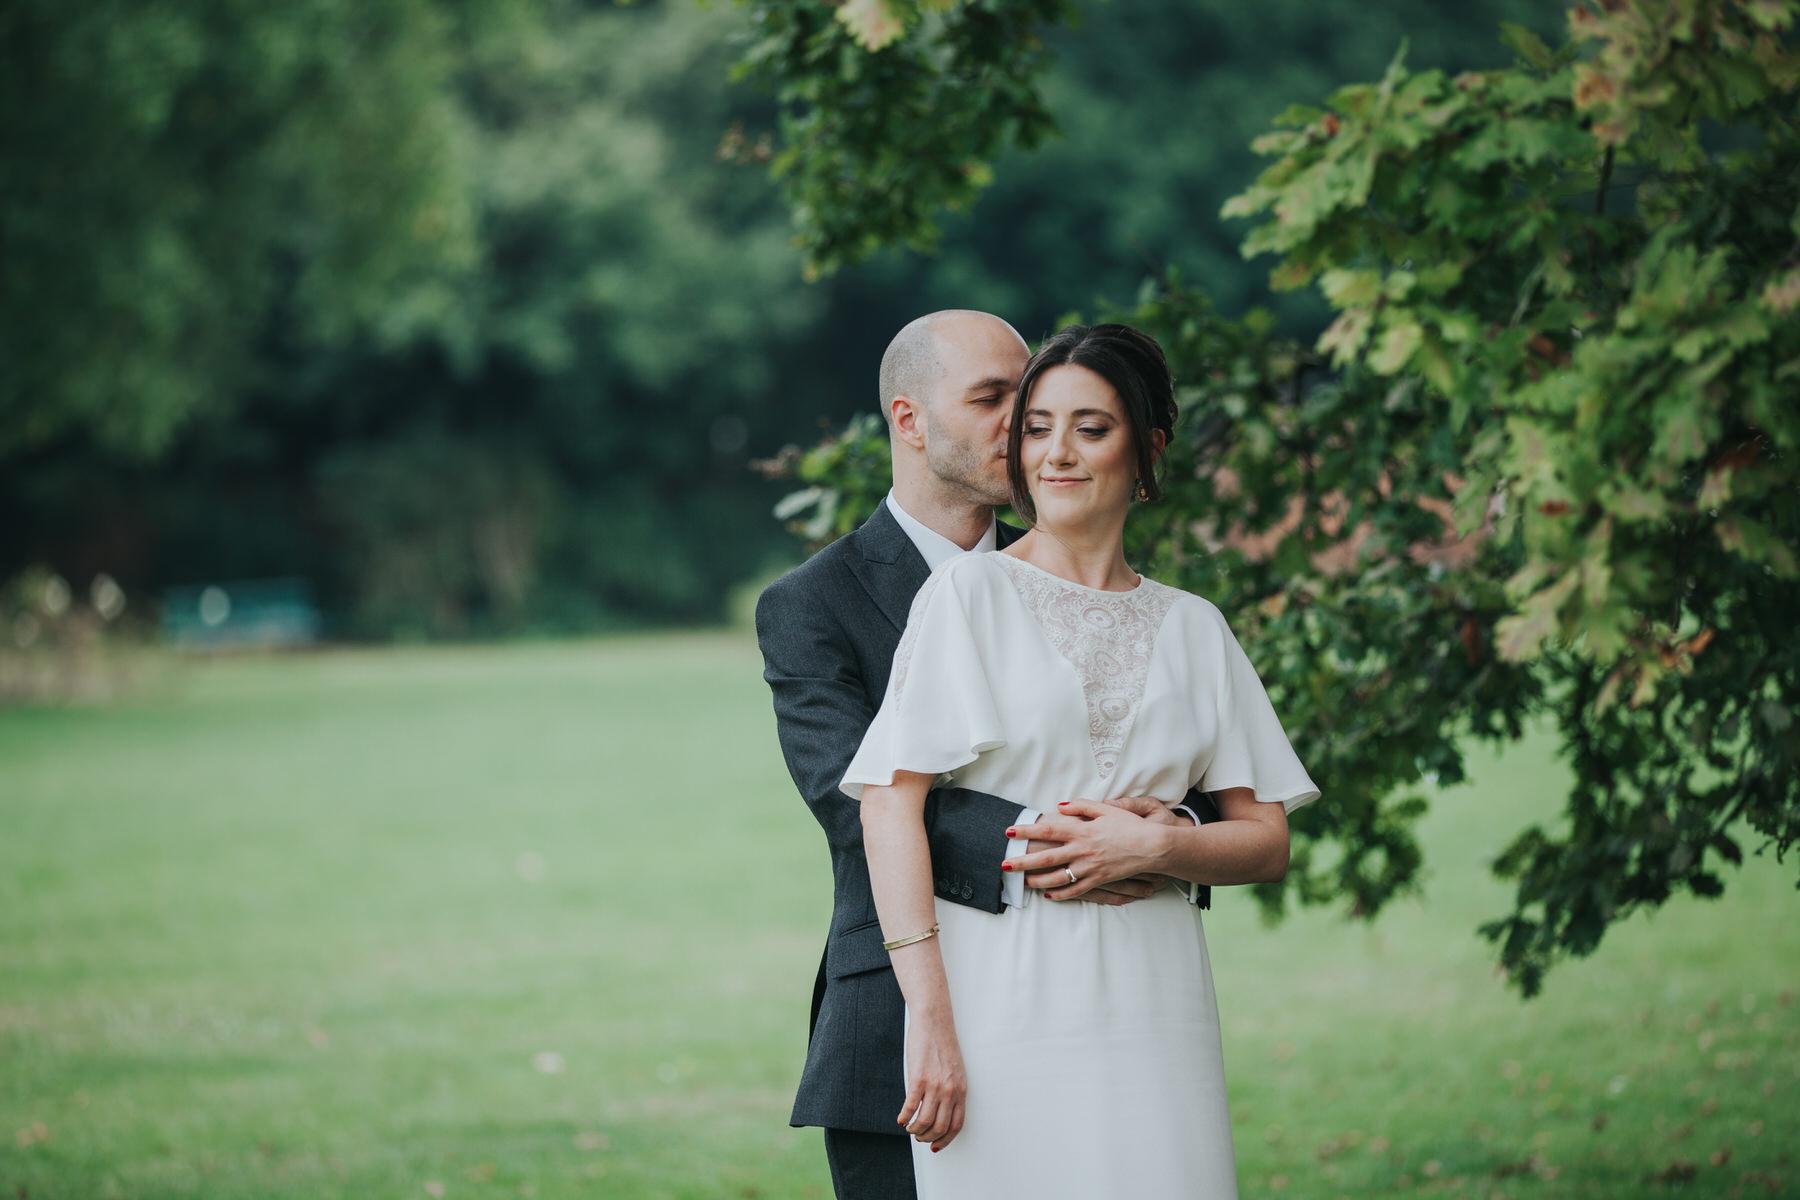 Belair House London wedding couple portraits in park